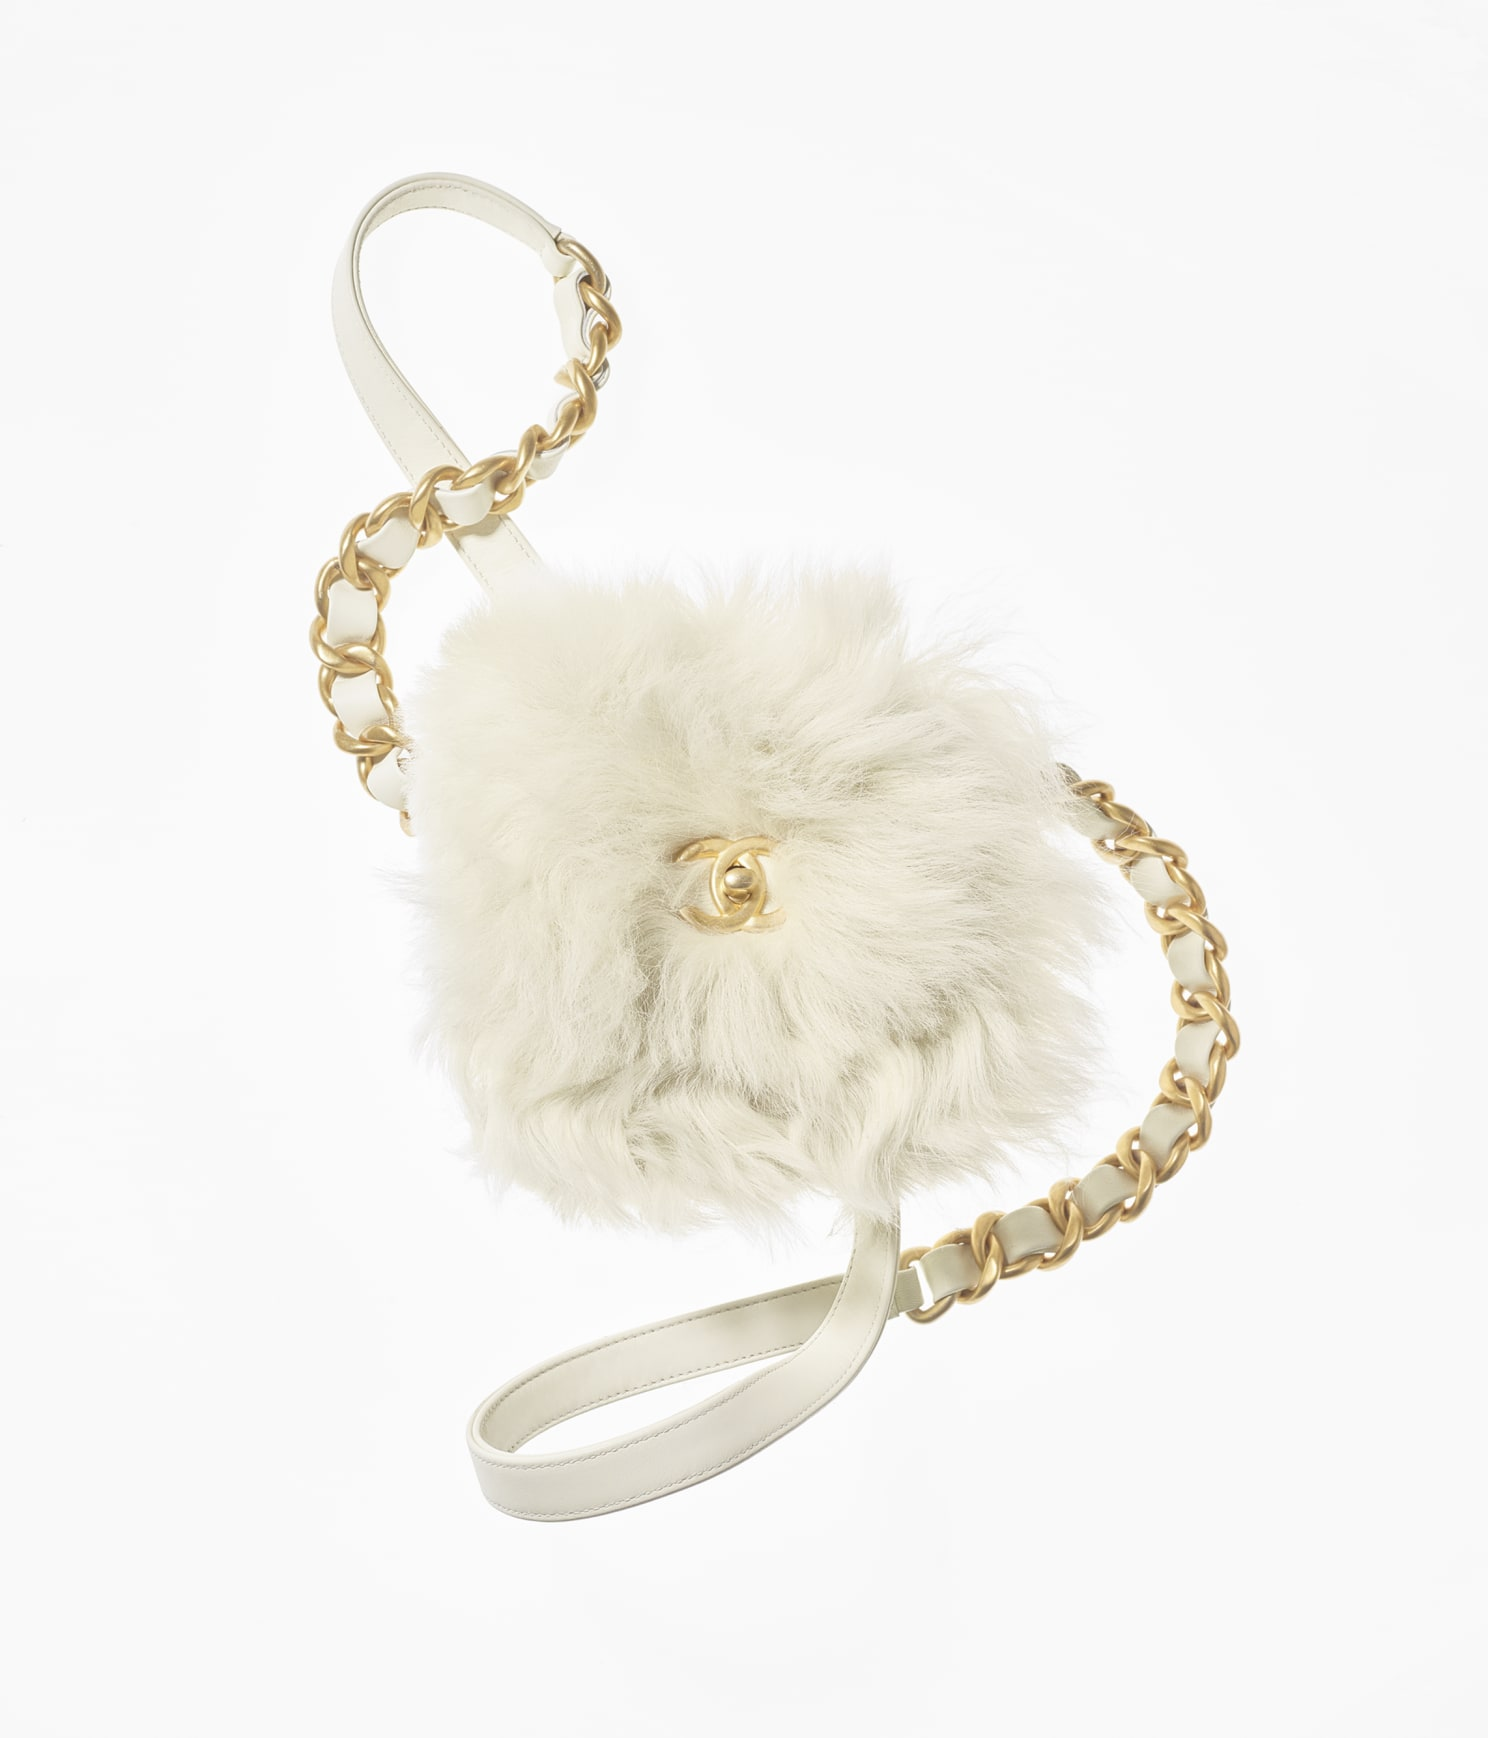 Chanel Mini Flap Bag in Shearling